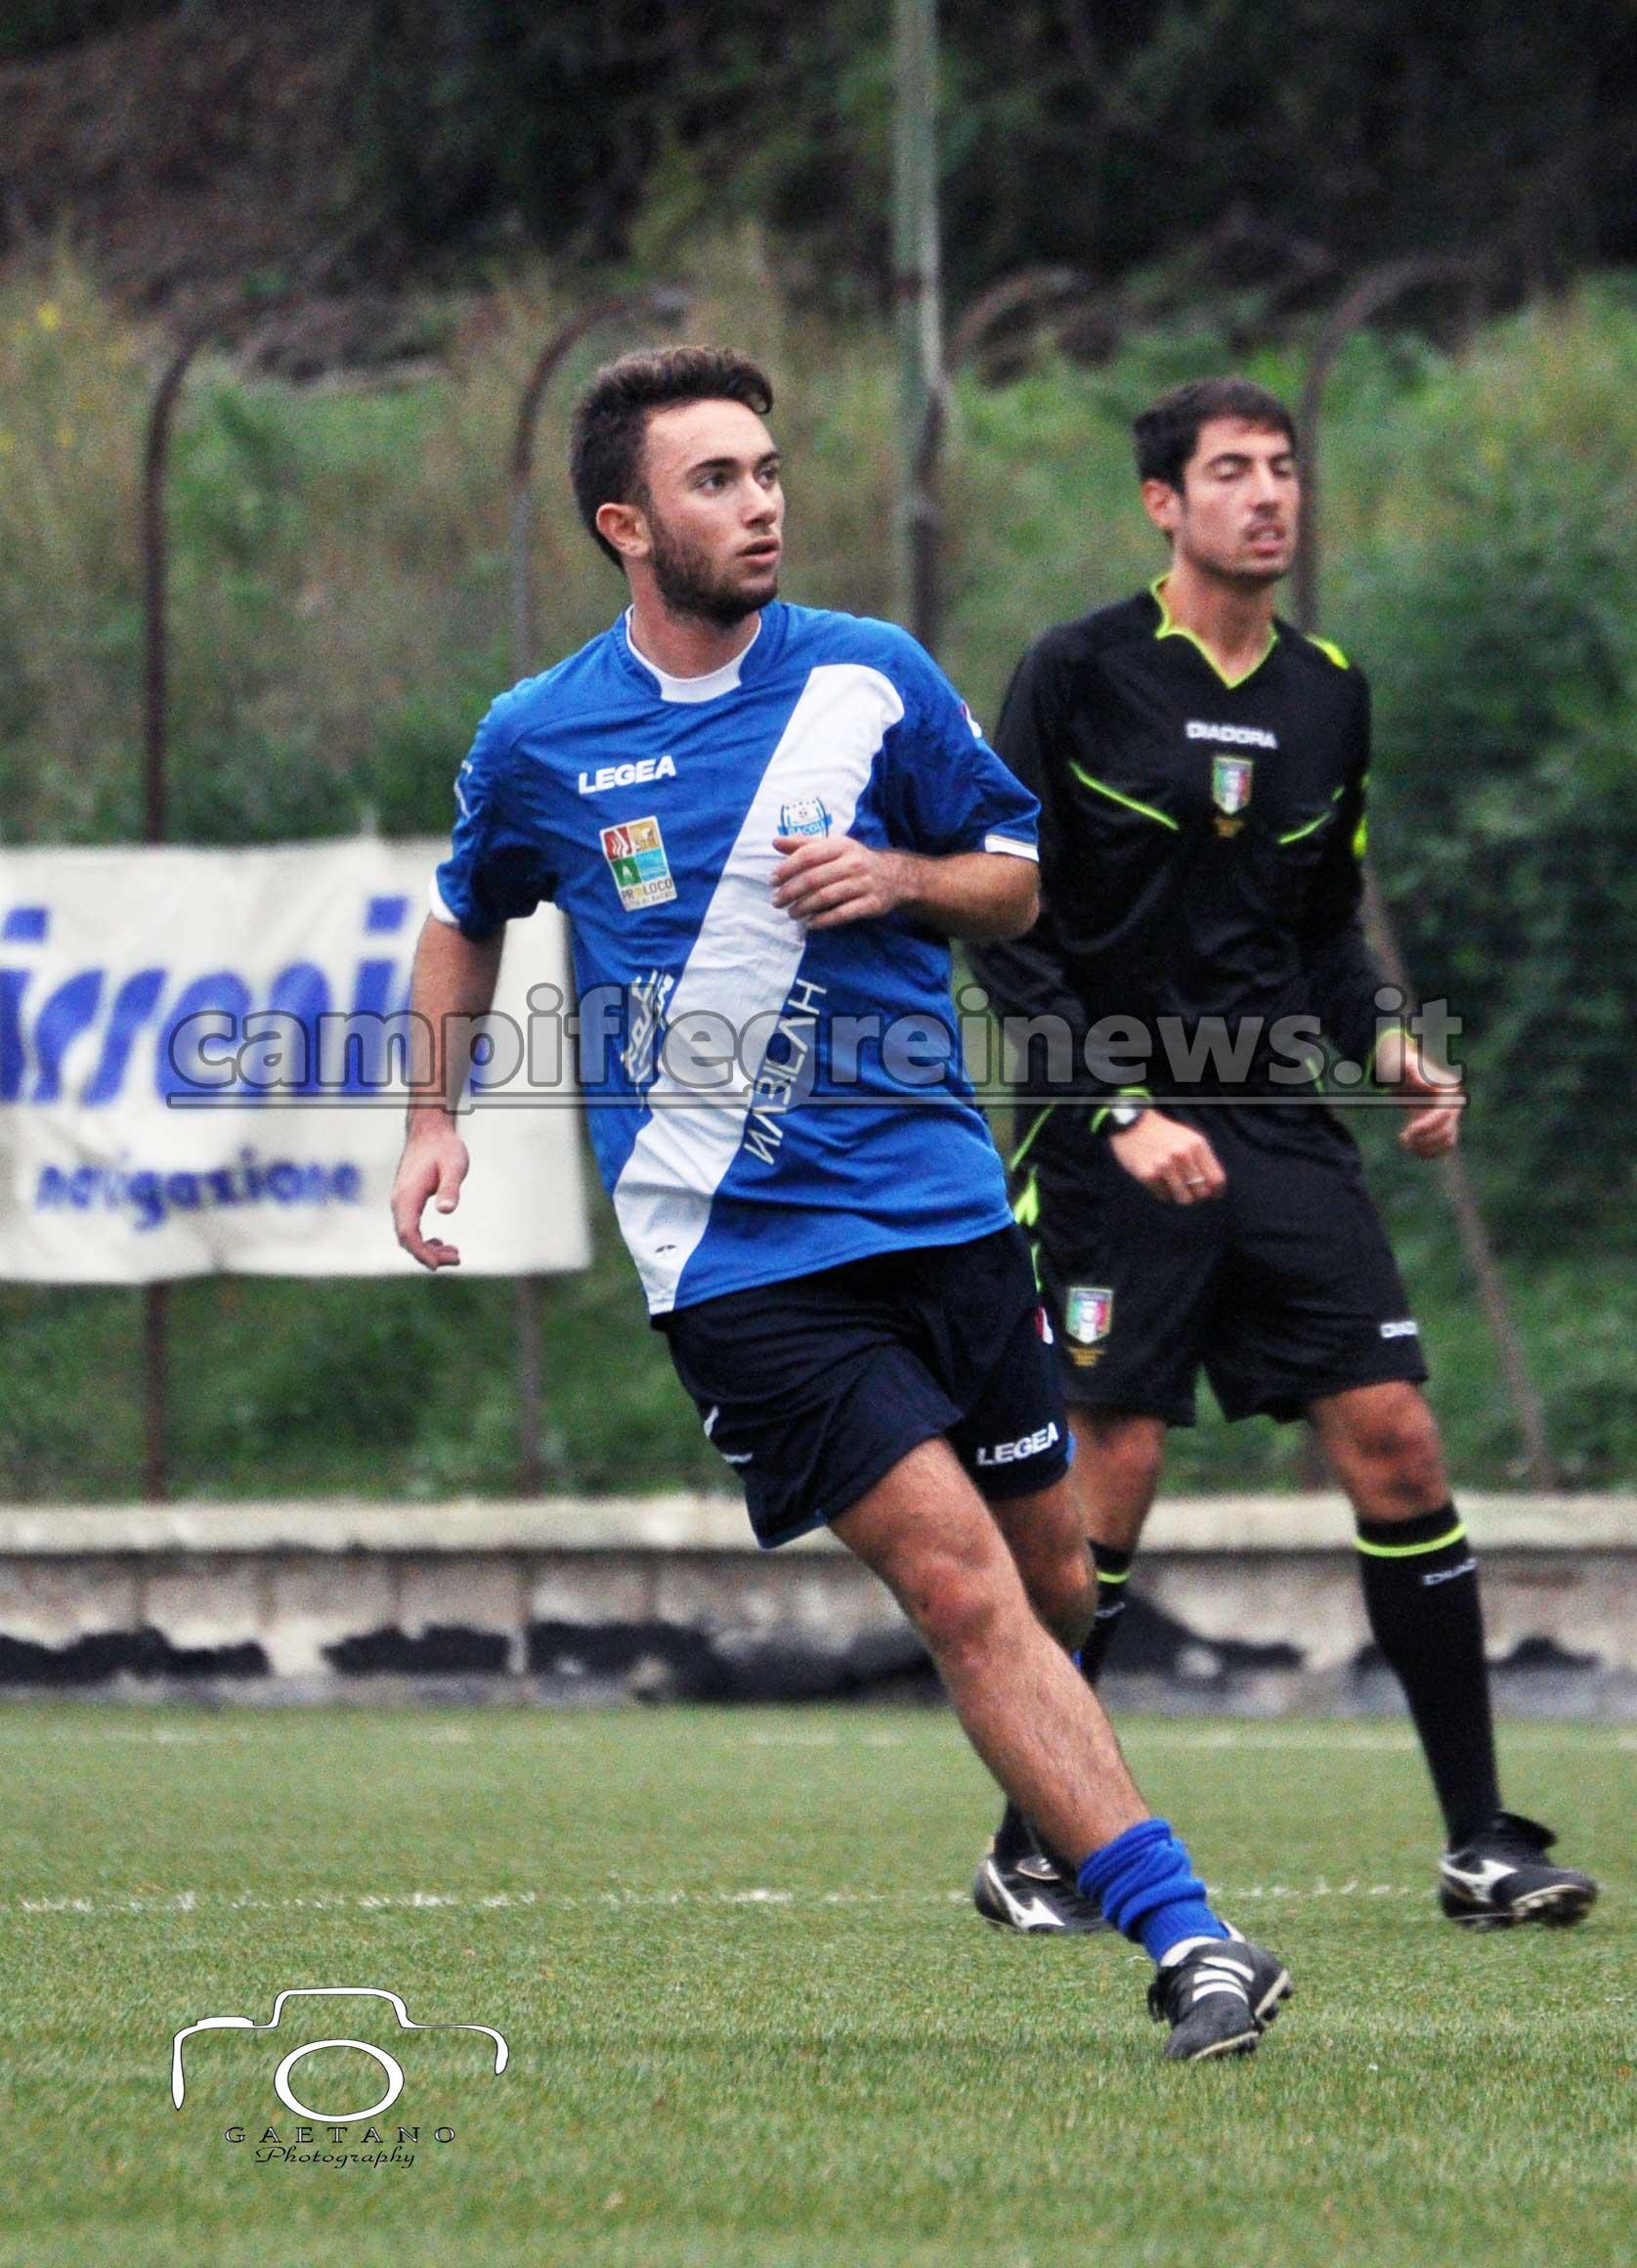 Pro Calcio Bacoli-San Giorgio - 09